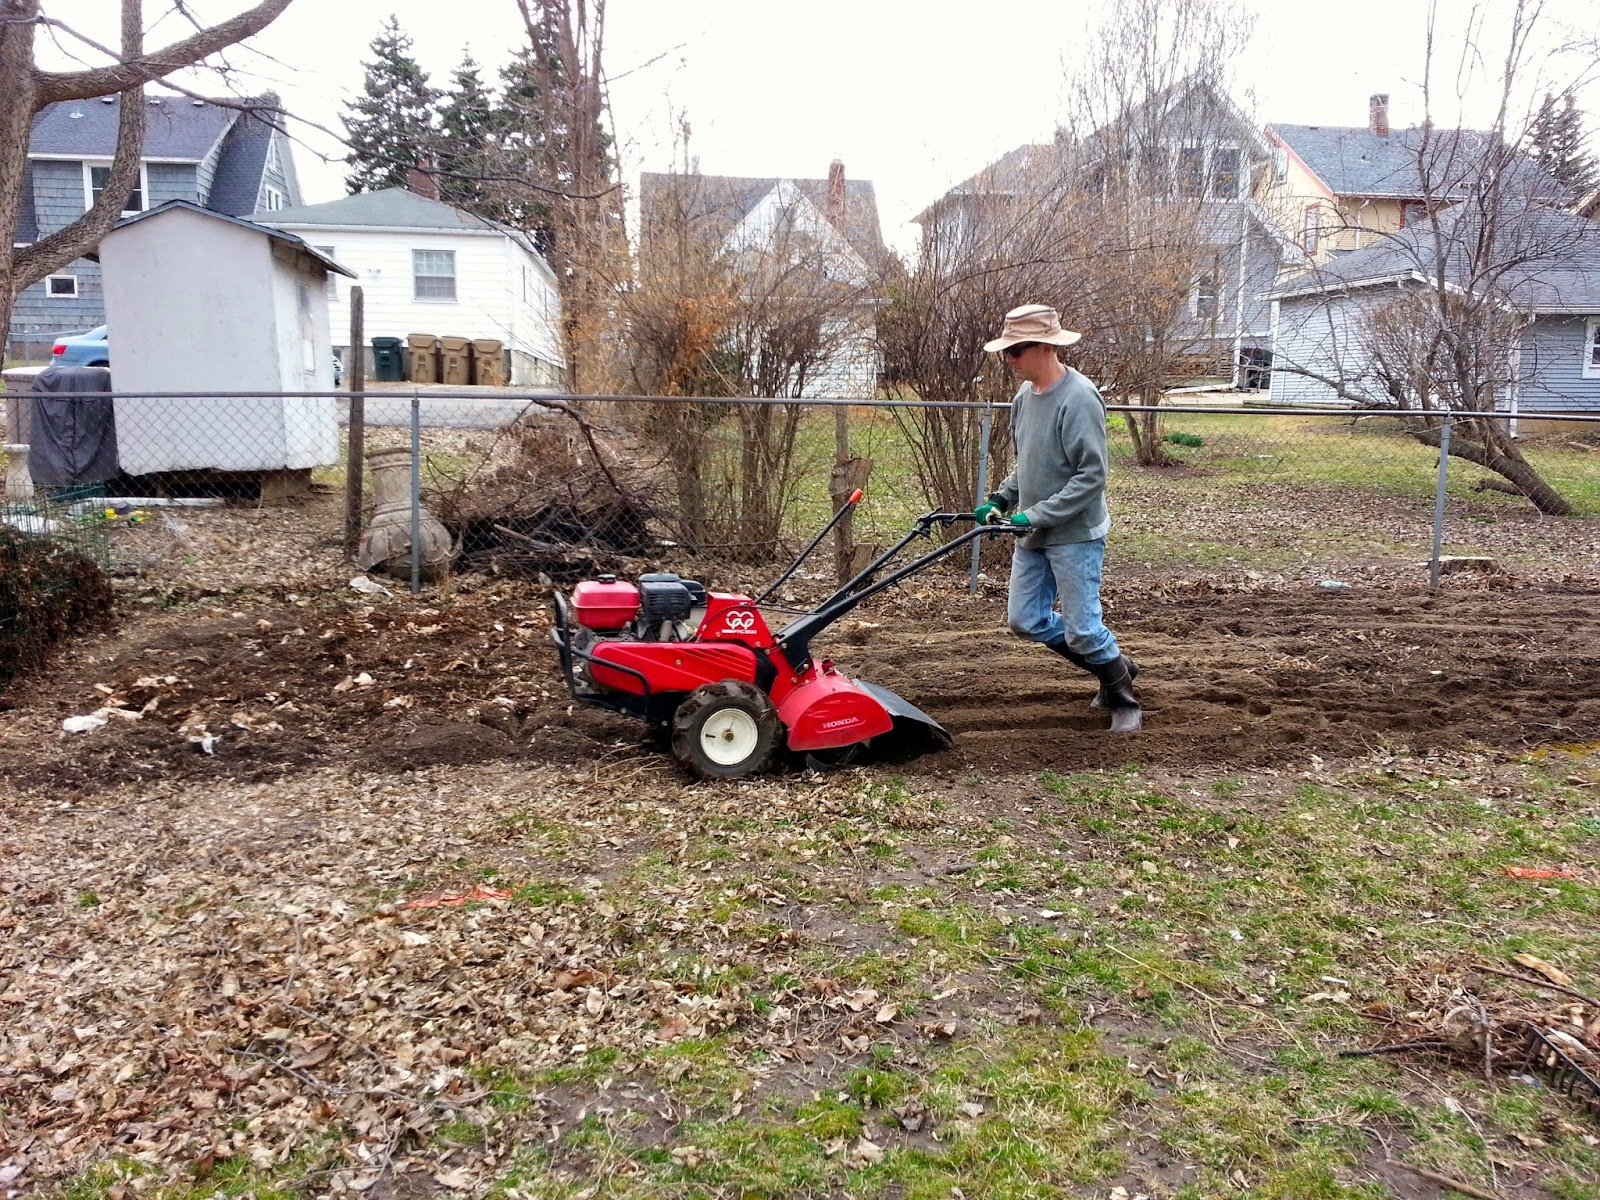 Rototill garden garden ftempo for Garden state orthopedics fair lawn